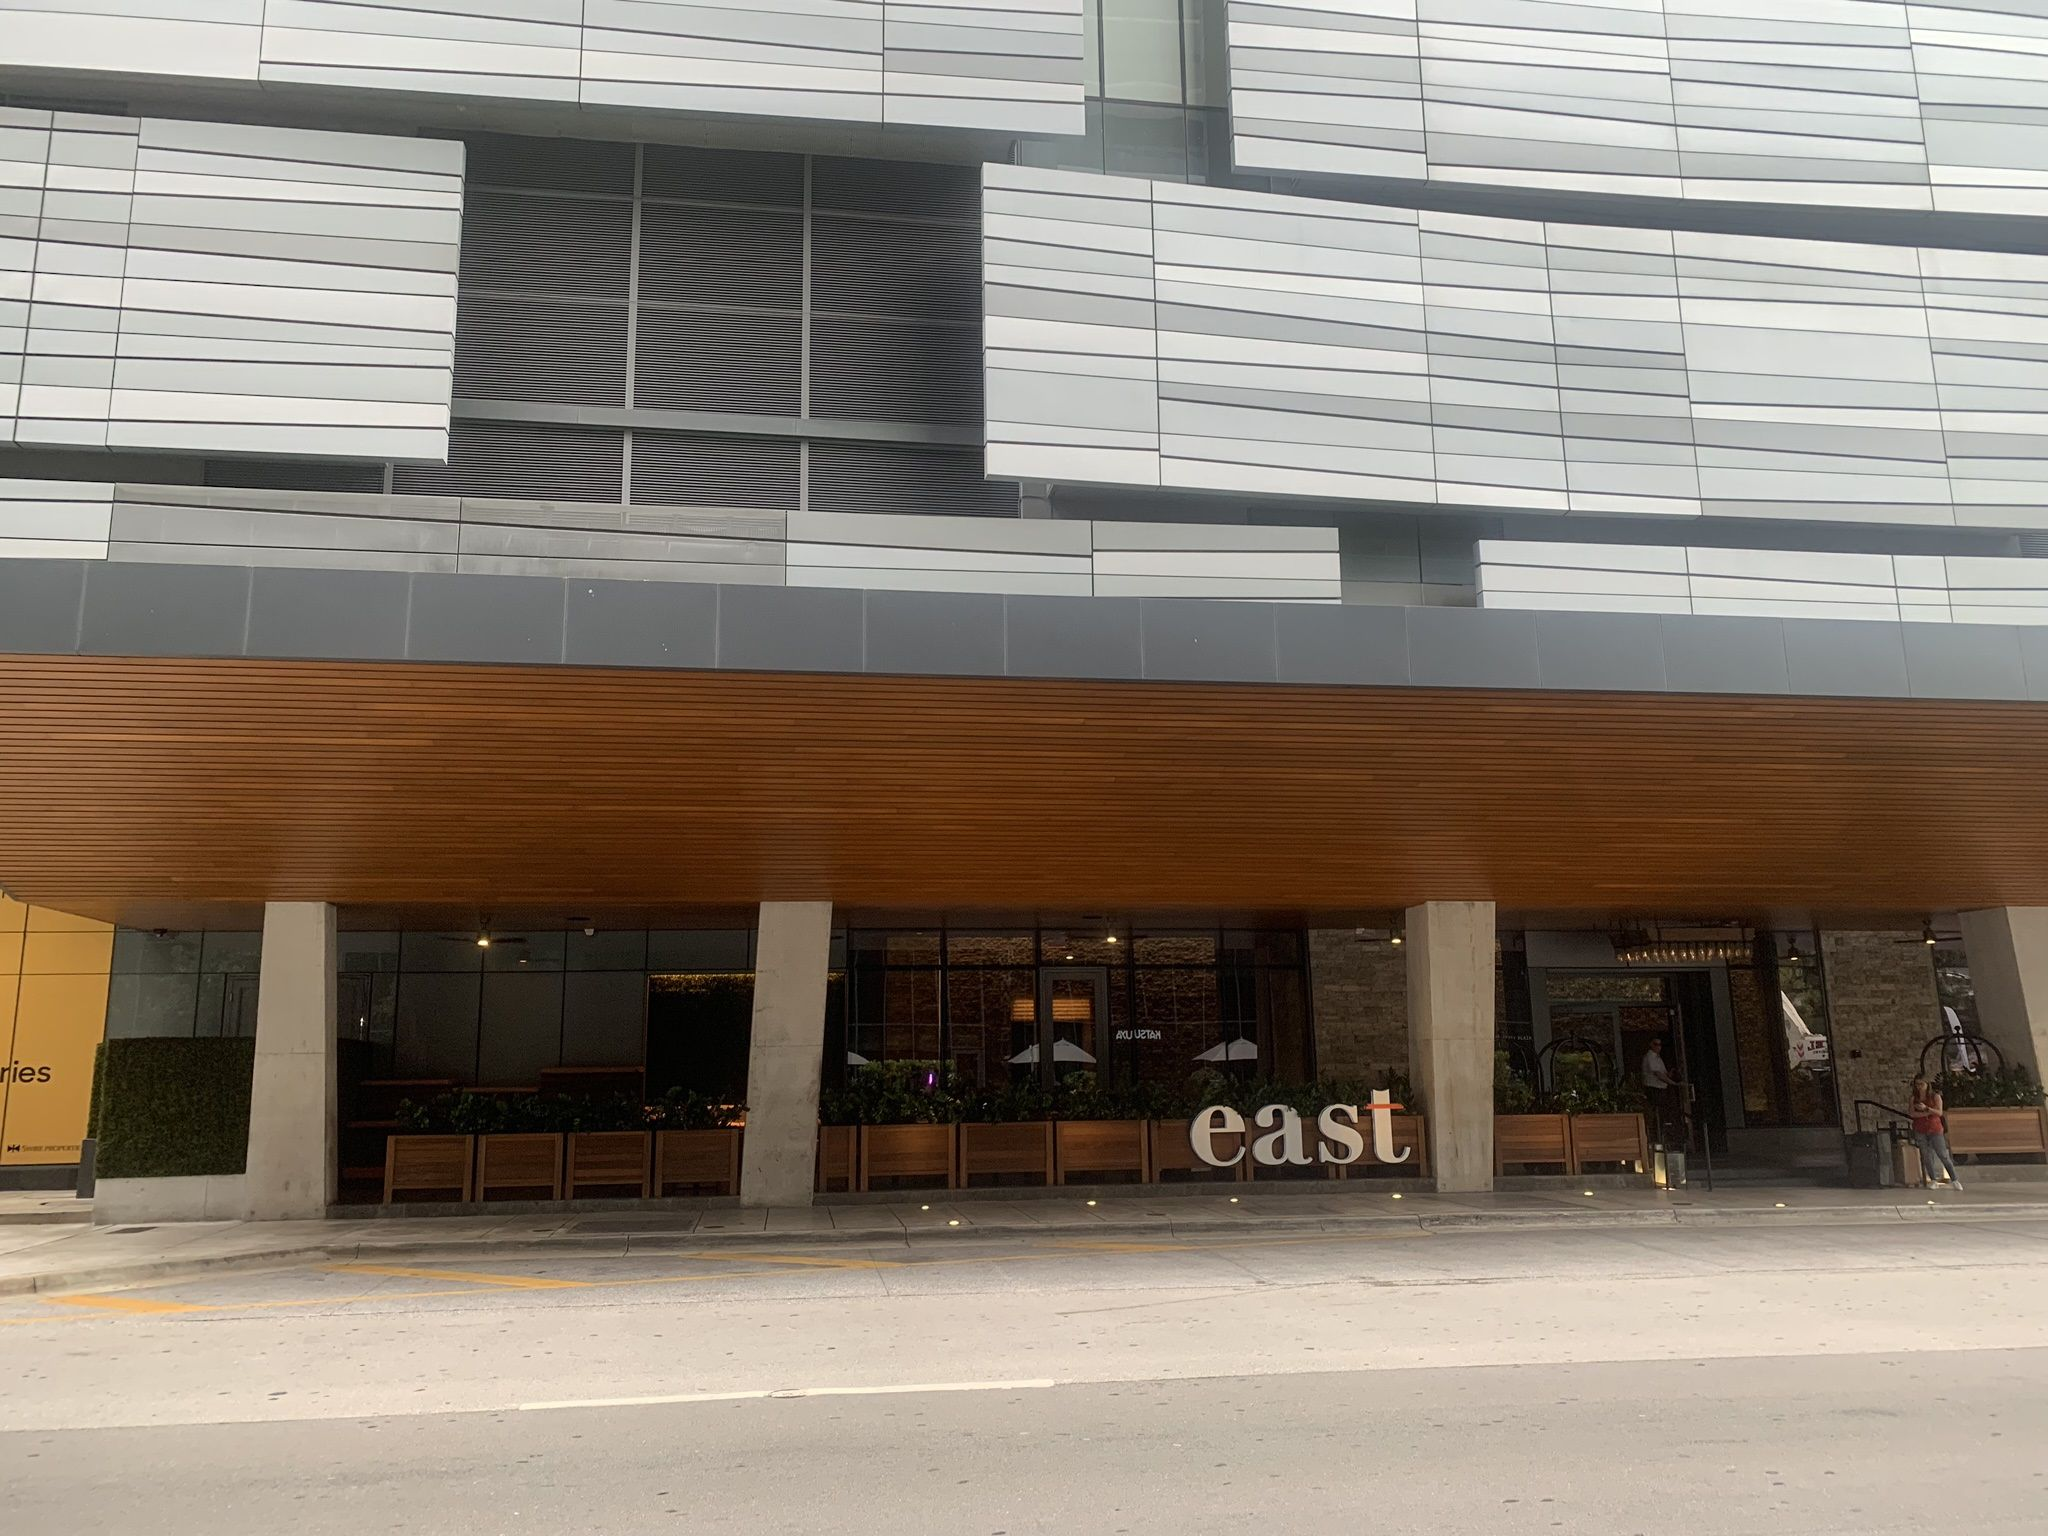 Entrance to East Miami